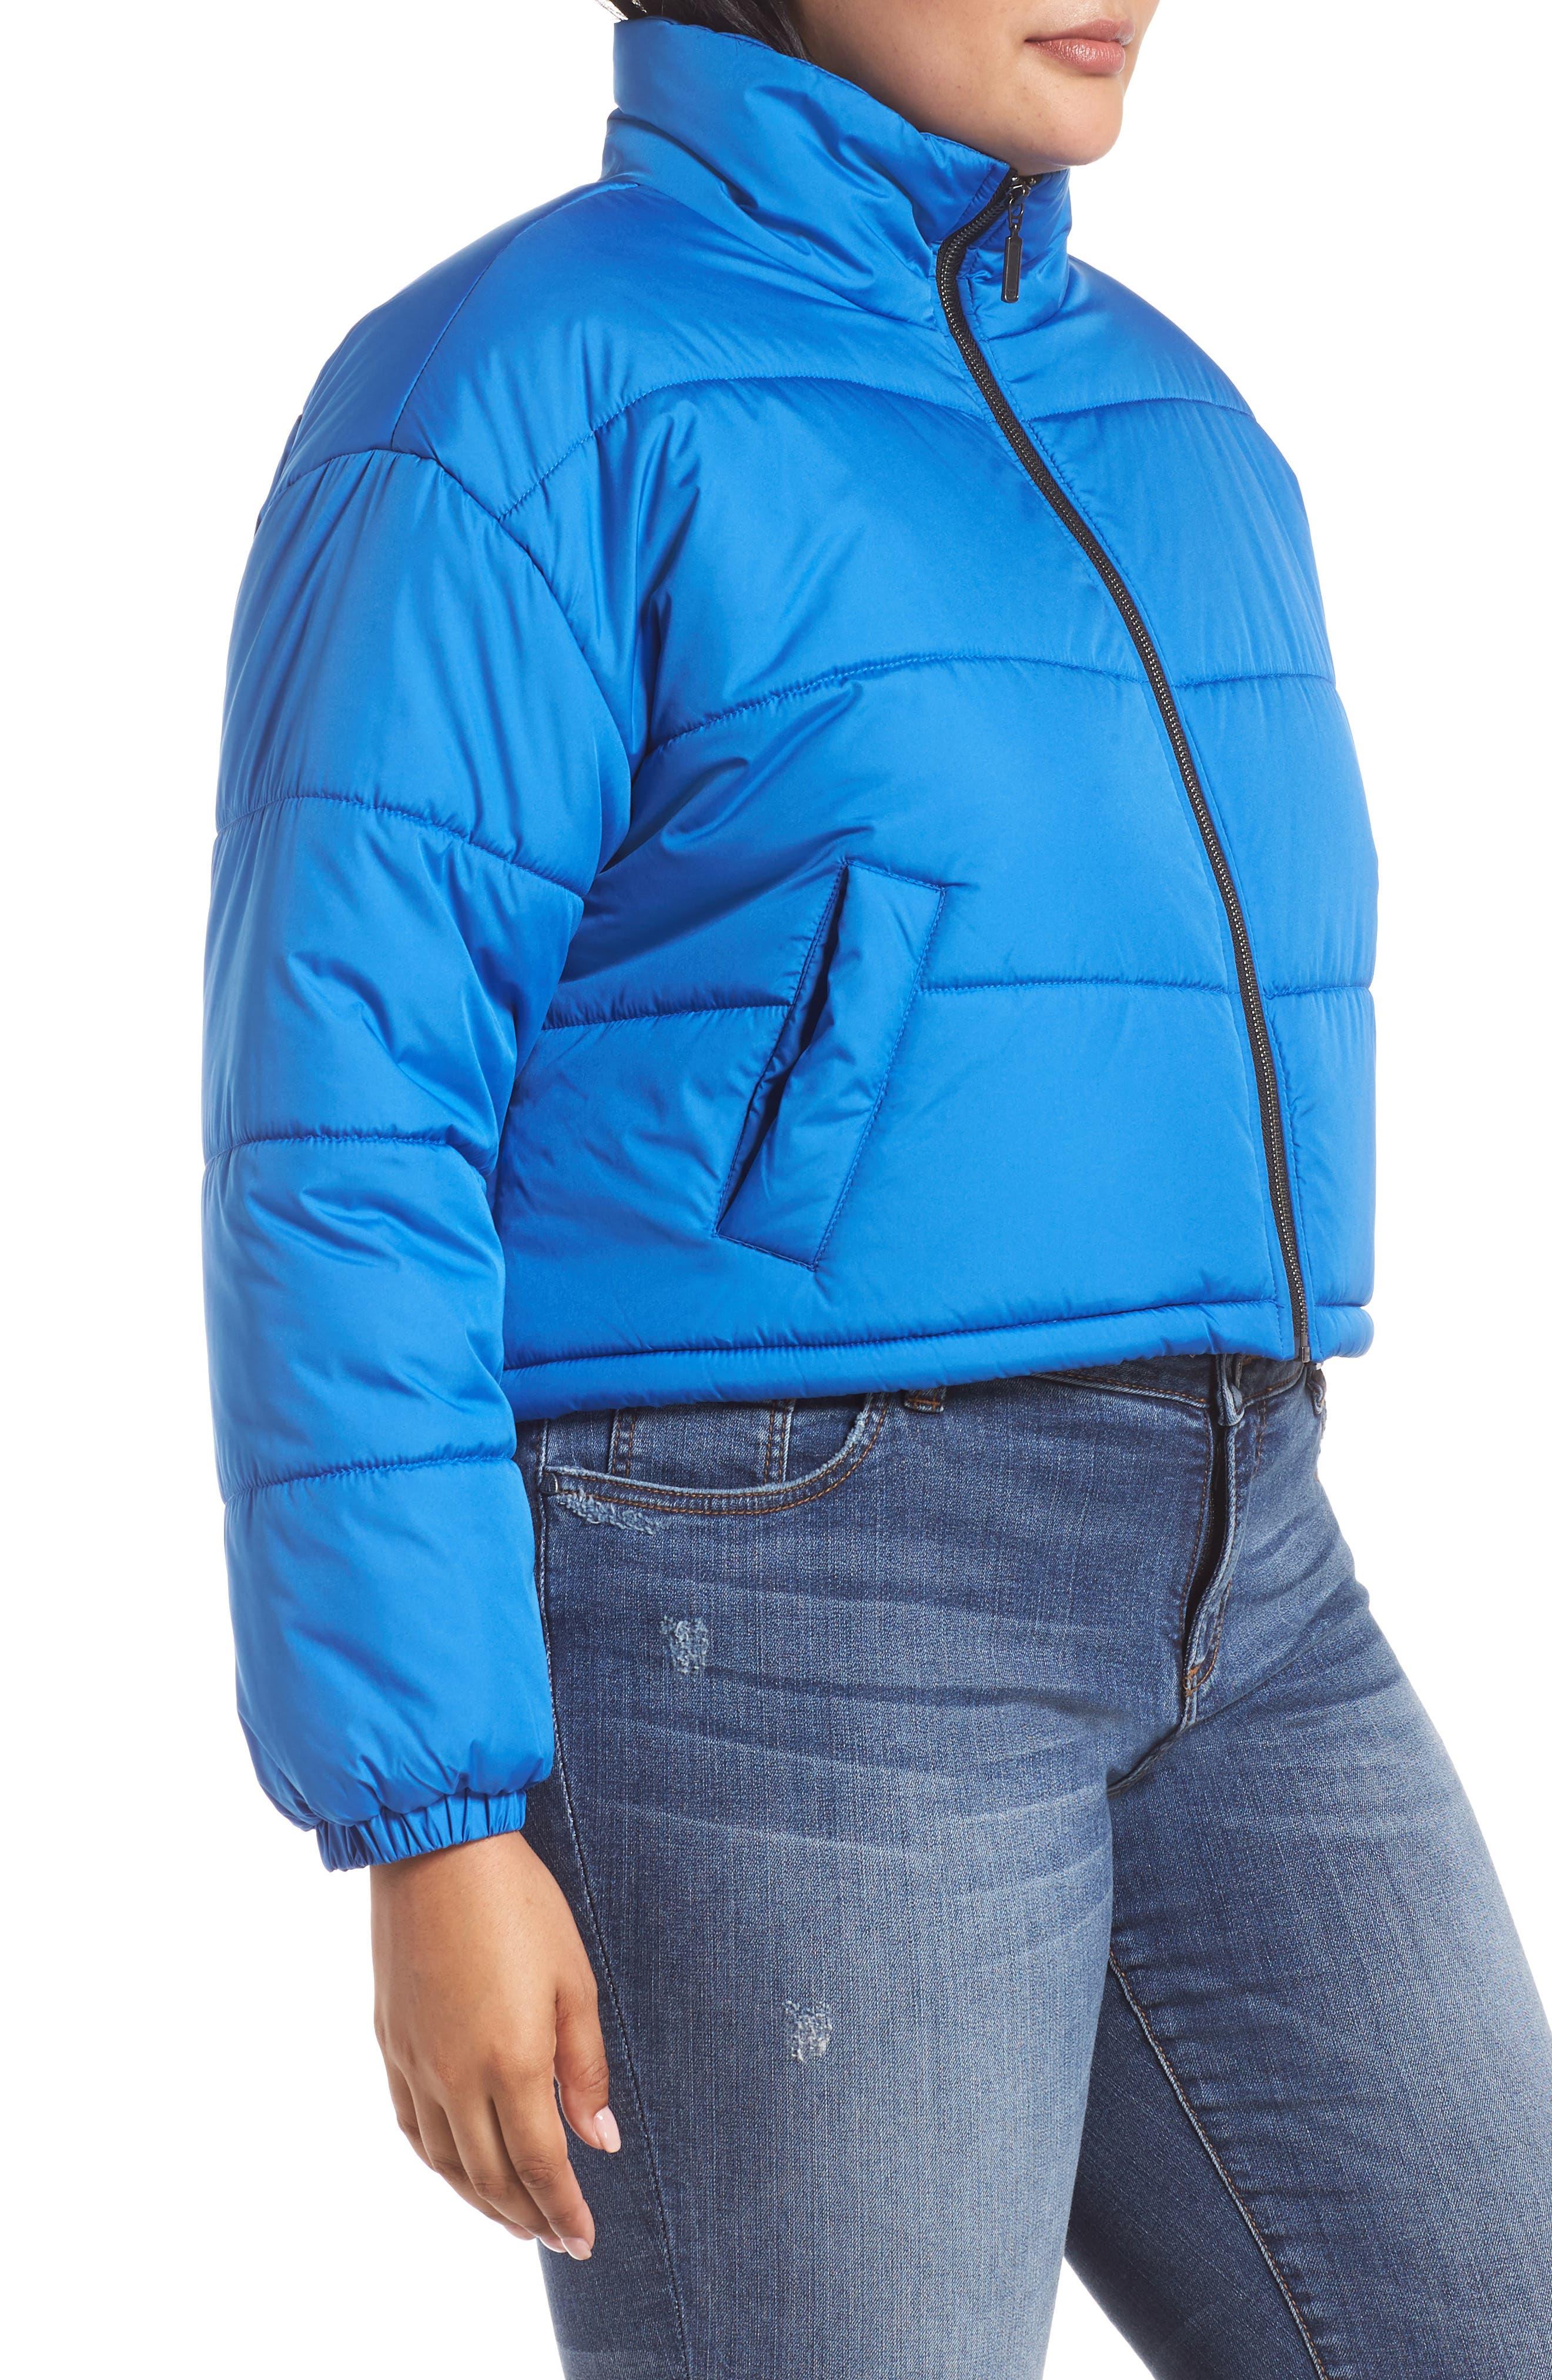 Crop Puffer Jacket,                             Alternate thumbnail 10, color,                             BLUE BOAT